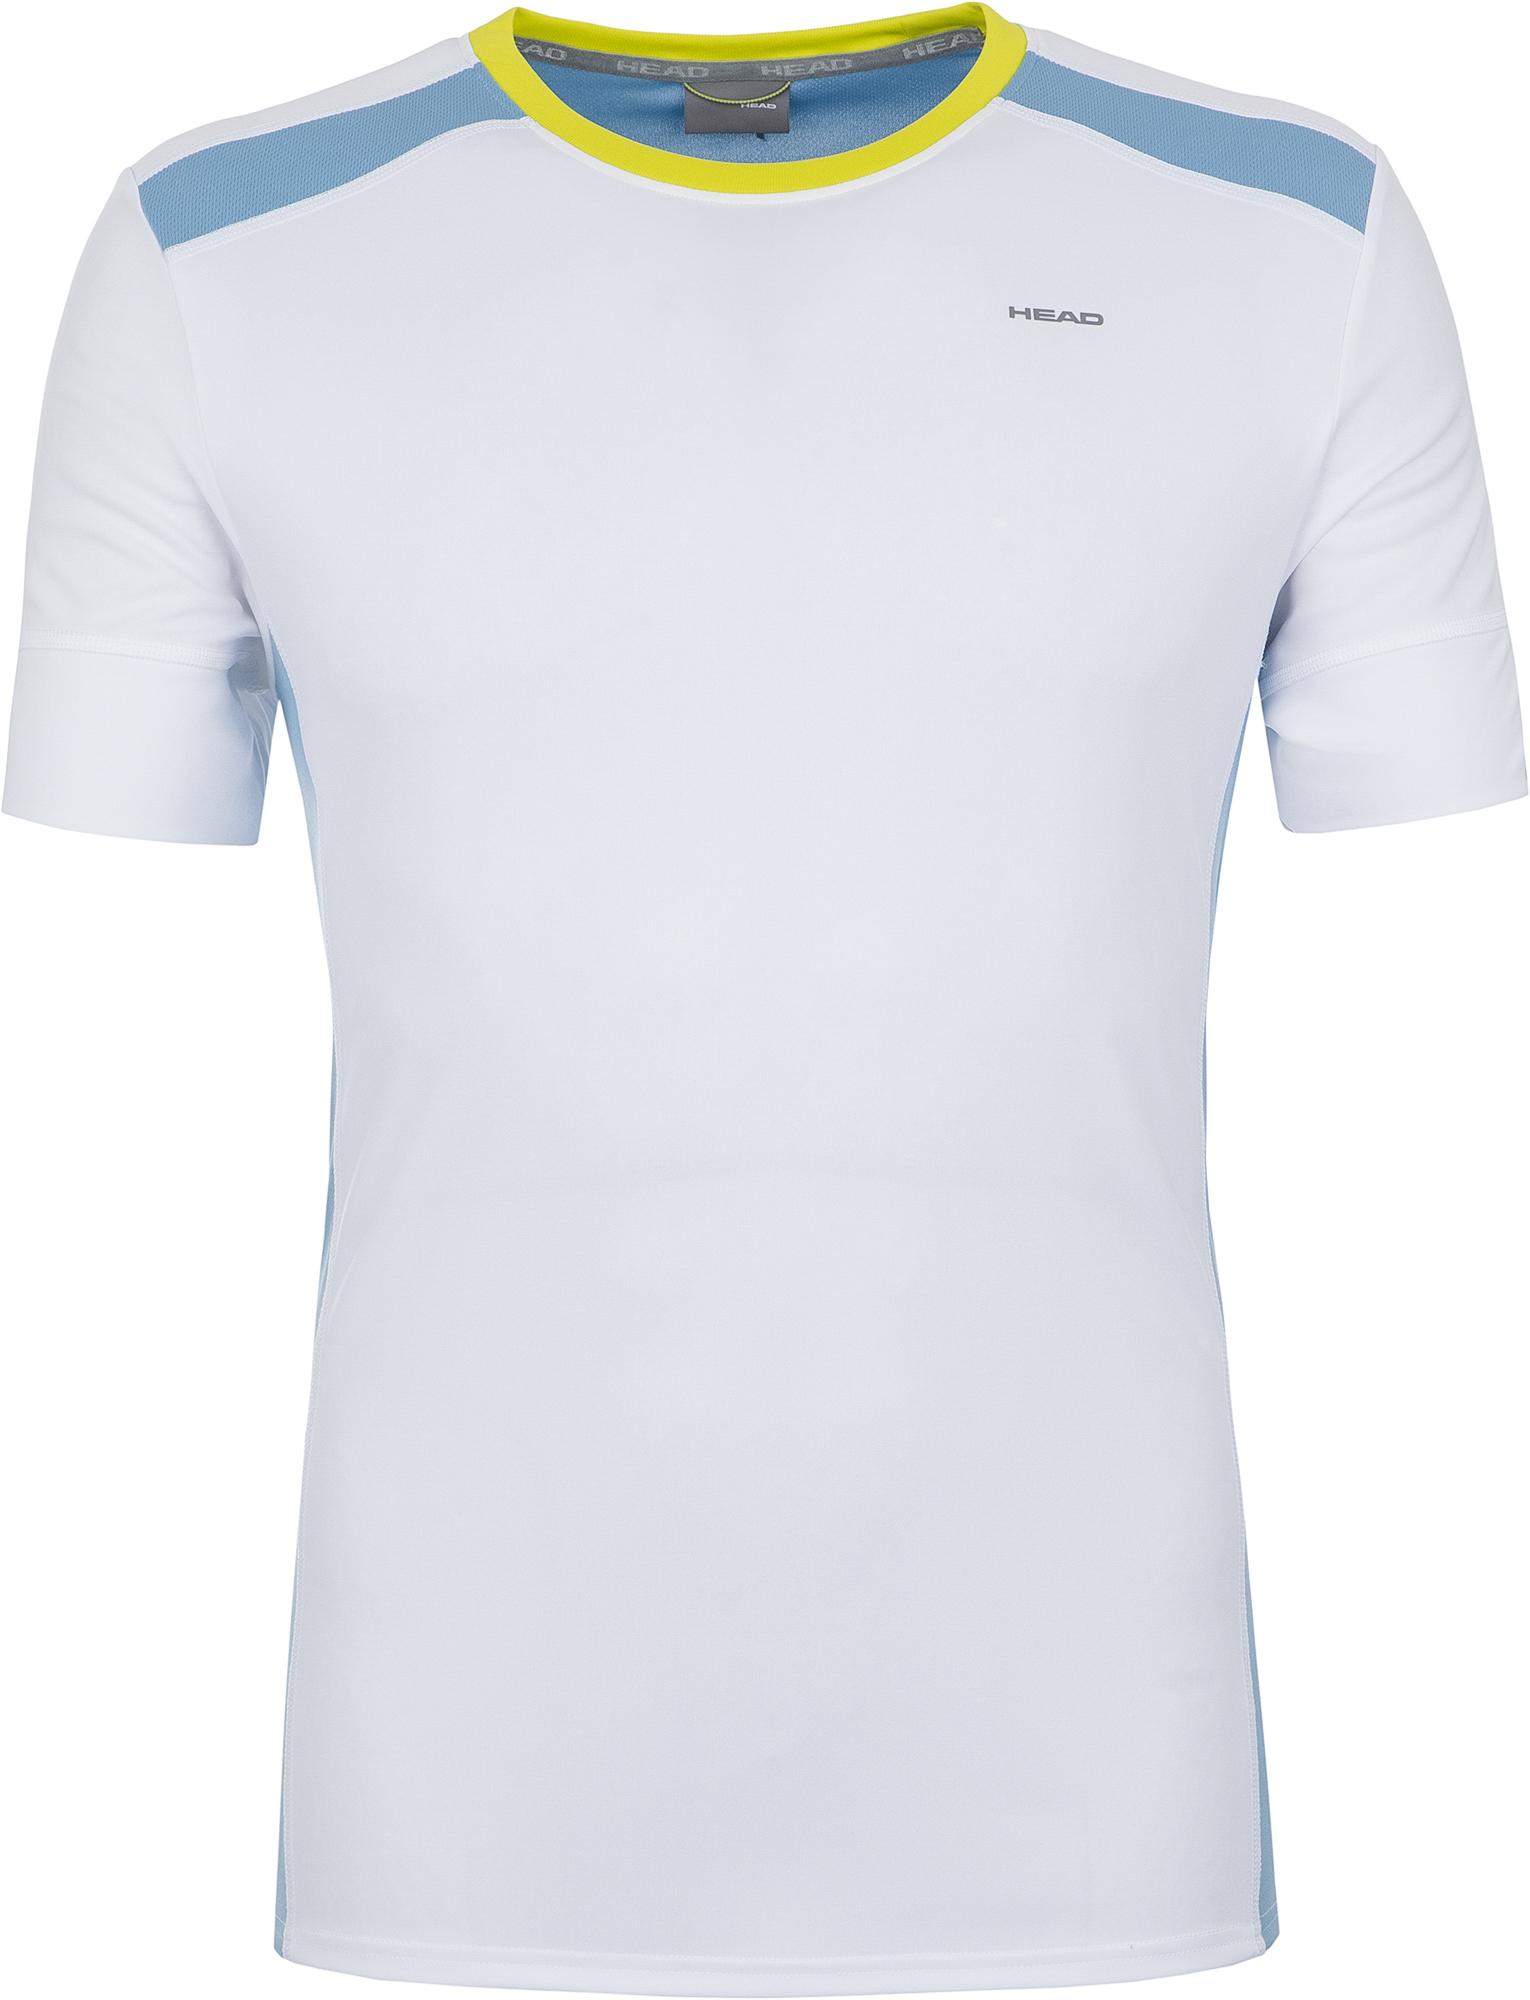 Head Футболка мужская Head Uni, размер 48 цена 2017